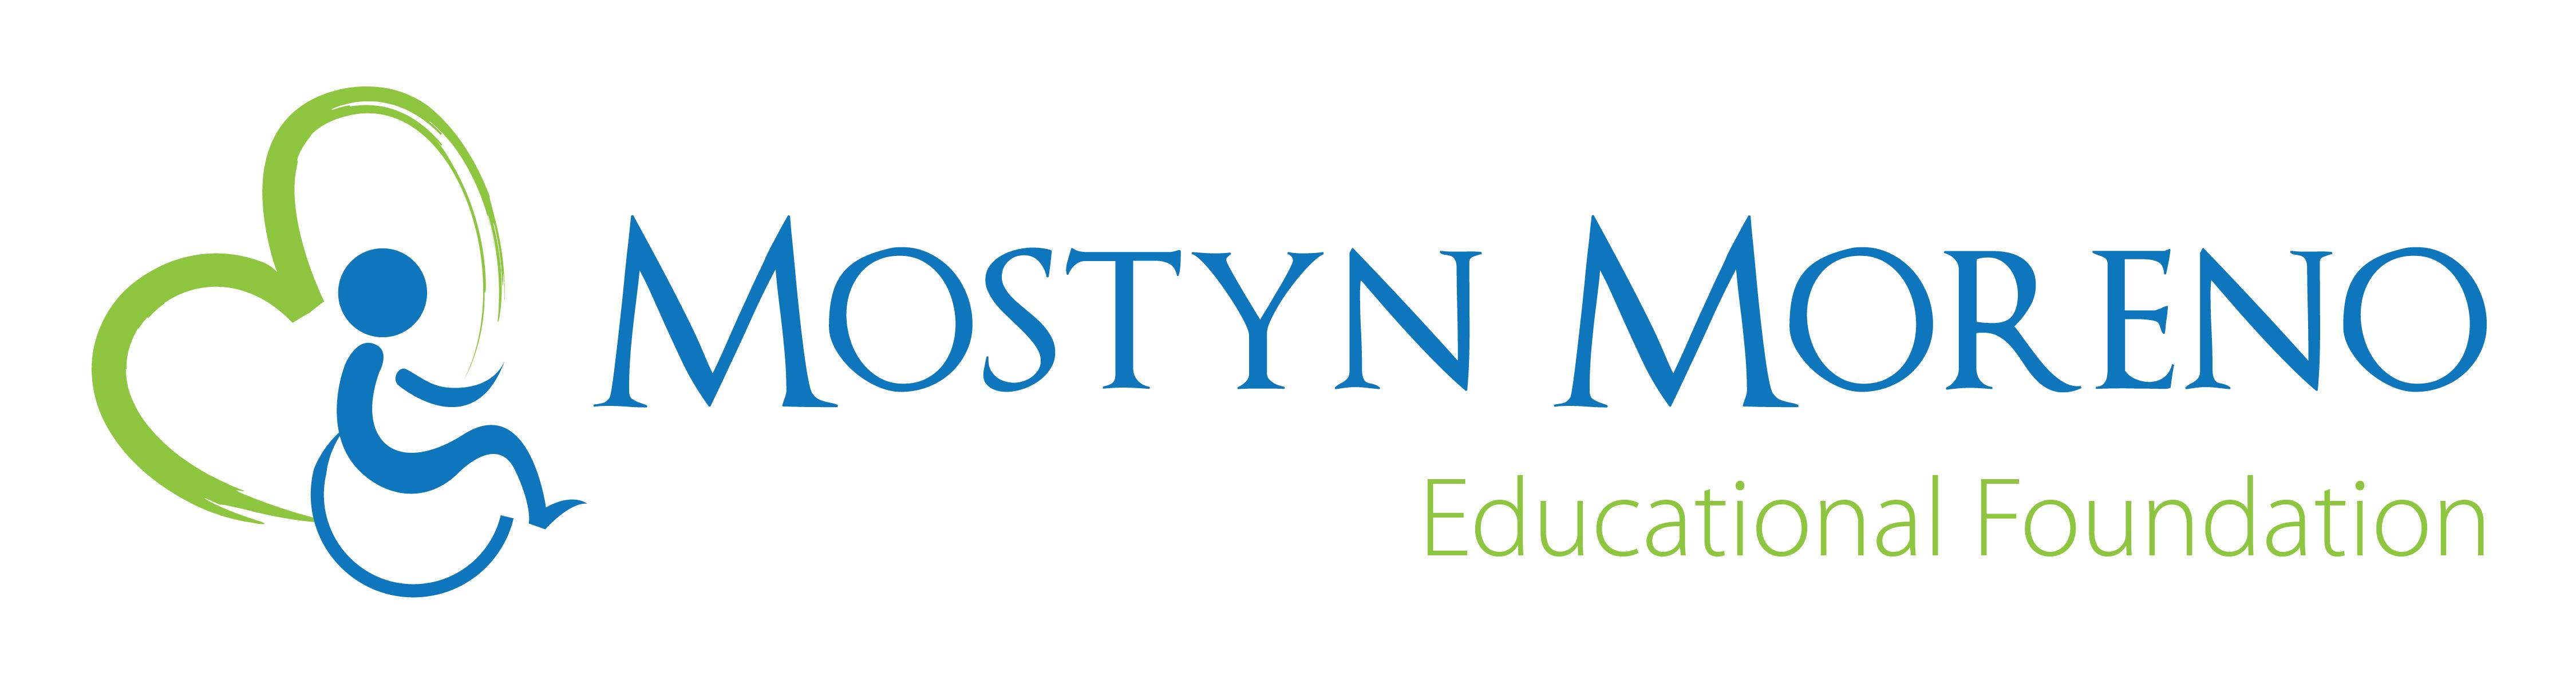 Glenda Jean Mostyn and Joe E Moreno Educational Foundation